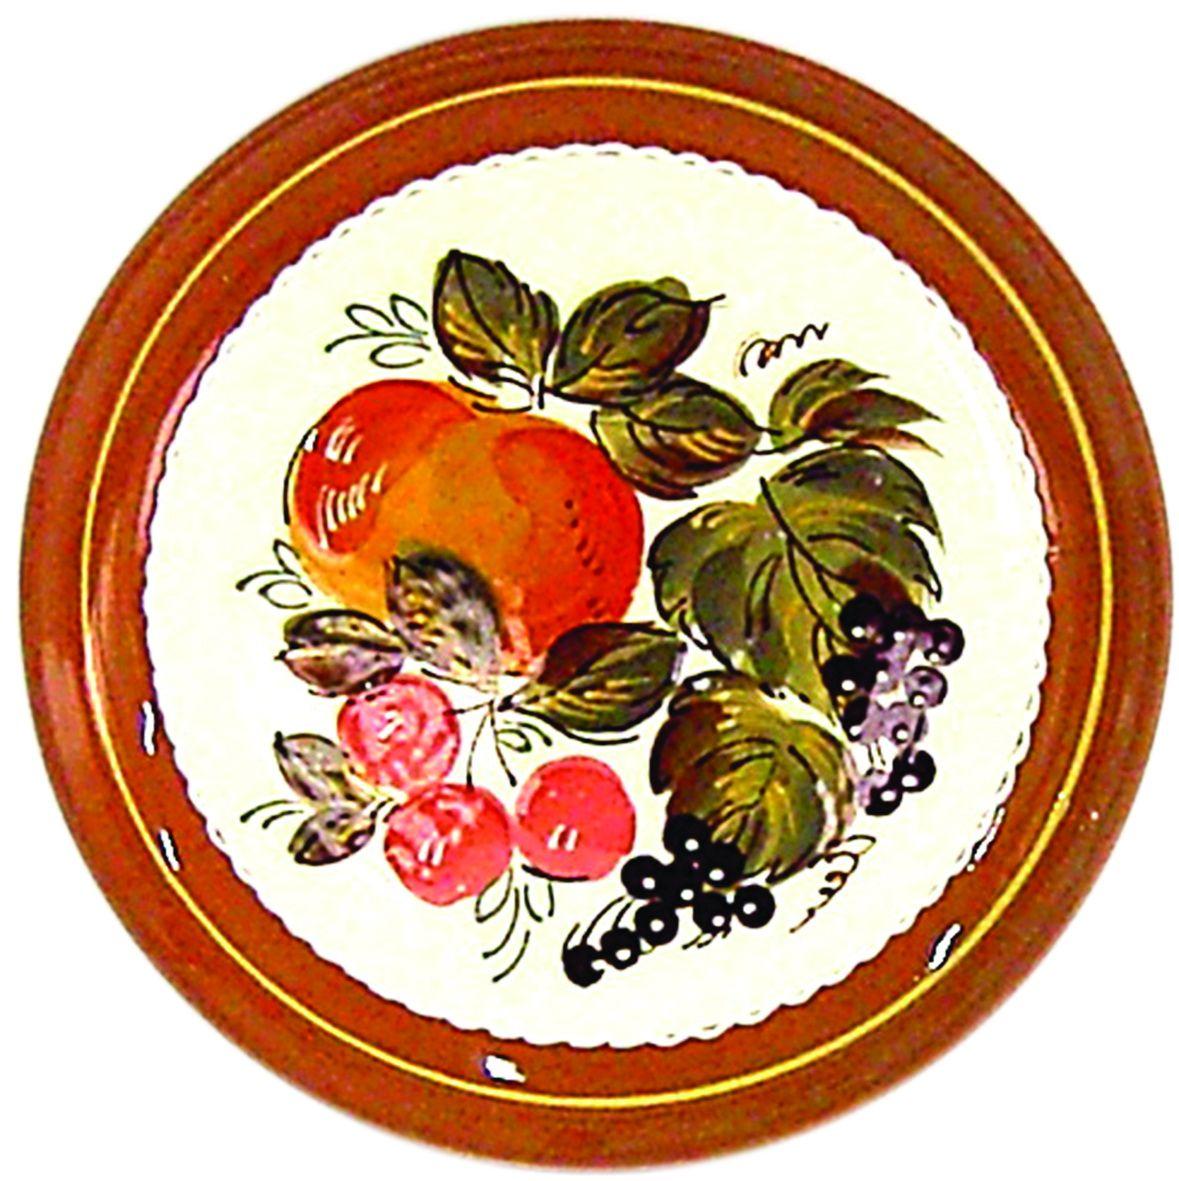 Tarusa artist / Plate Fruit, 22cm